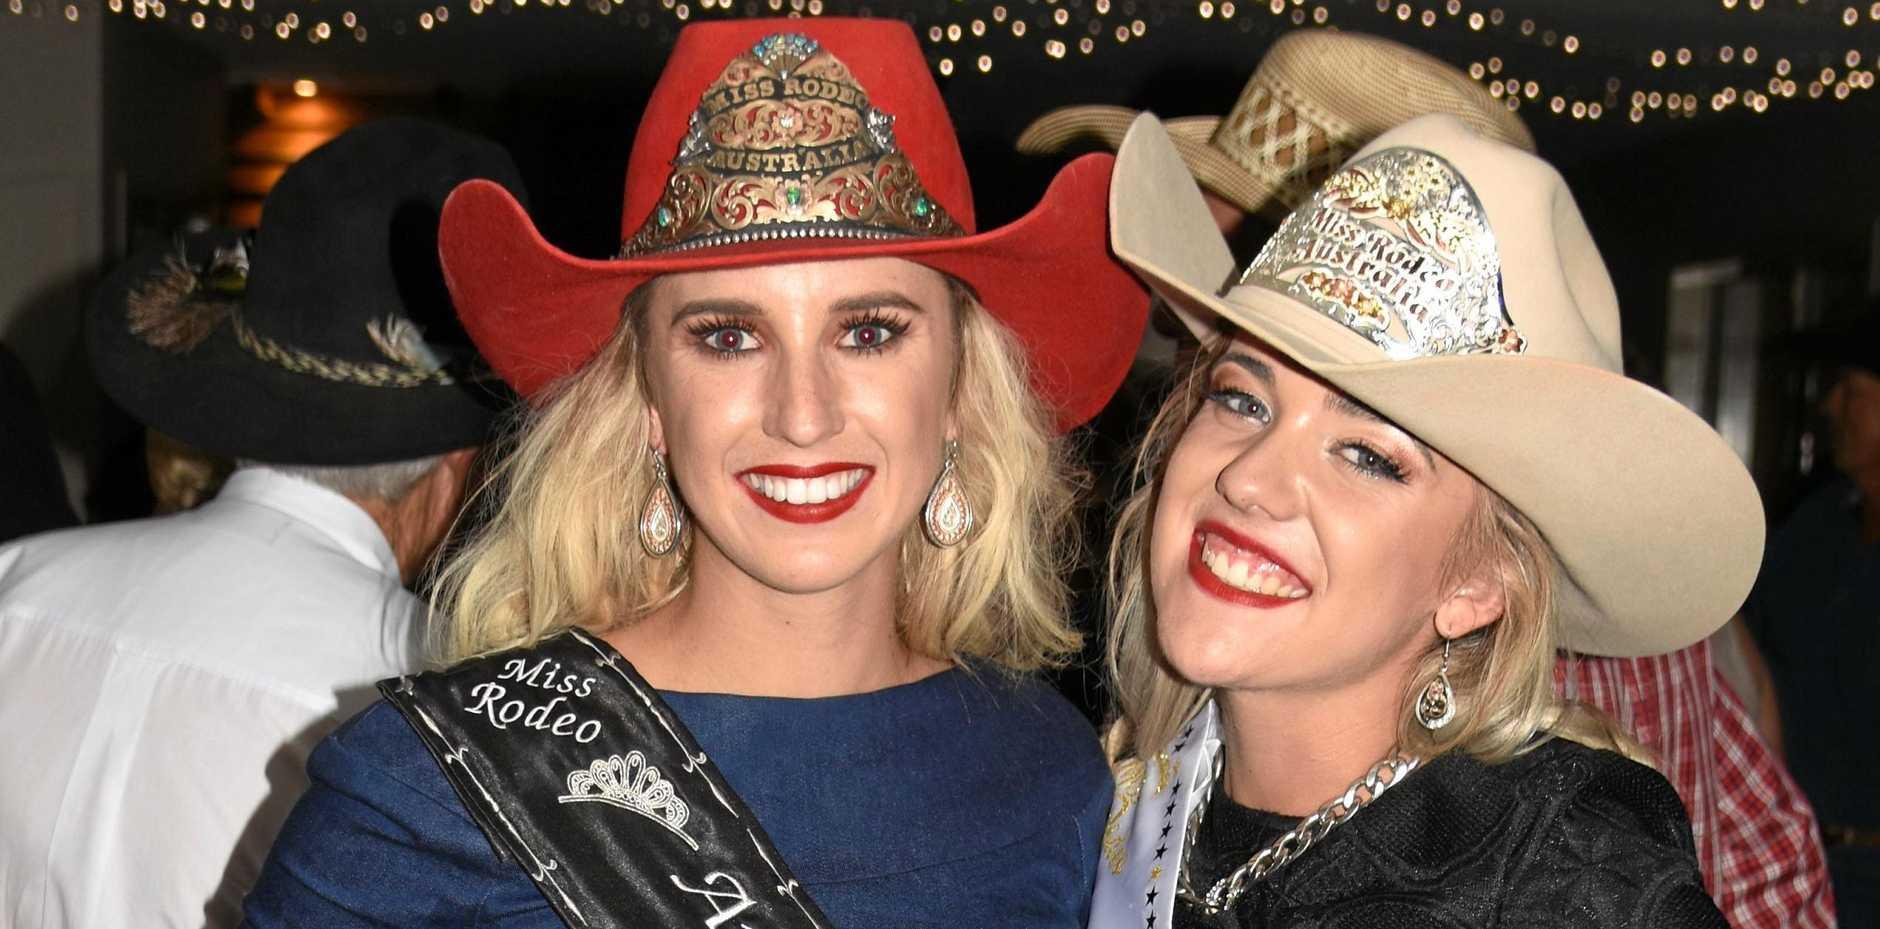 WINNER: Miss Rodeo Australia 2018 Dakota Michaelis from Petersborough after being crowned by Miss Rodeo Australia 2017 Emma Deicke in Warwick on Saturday night.